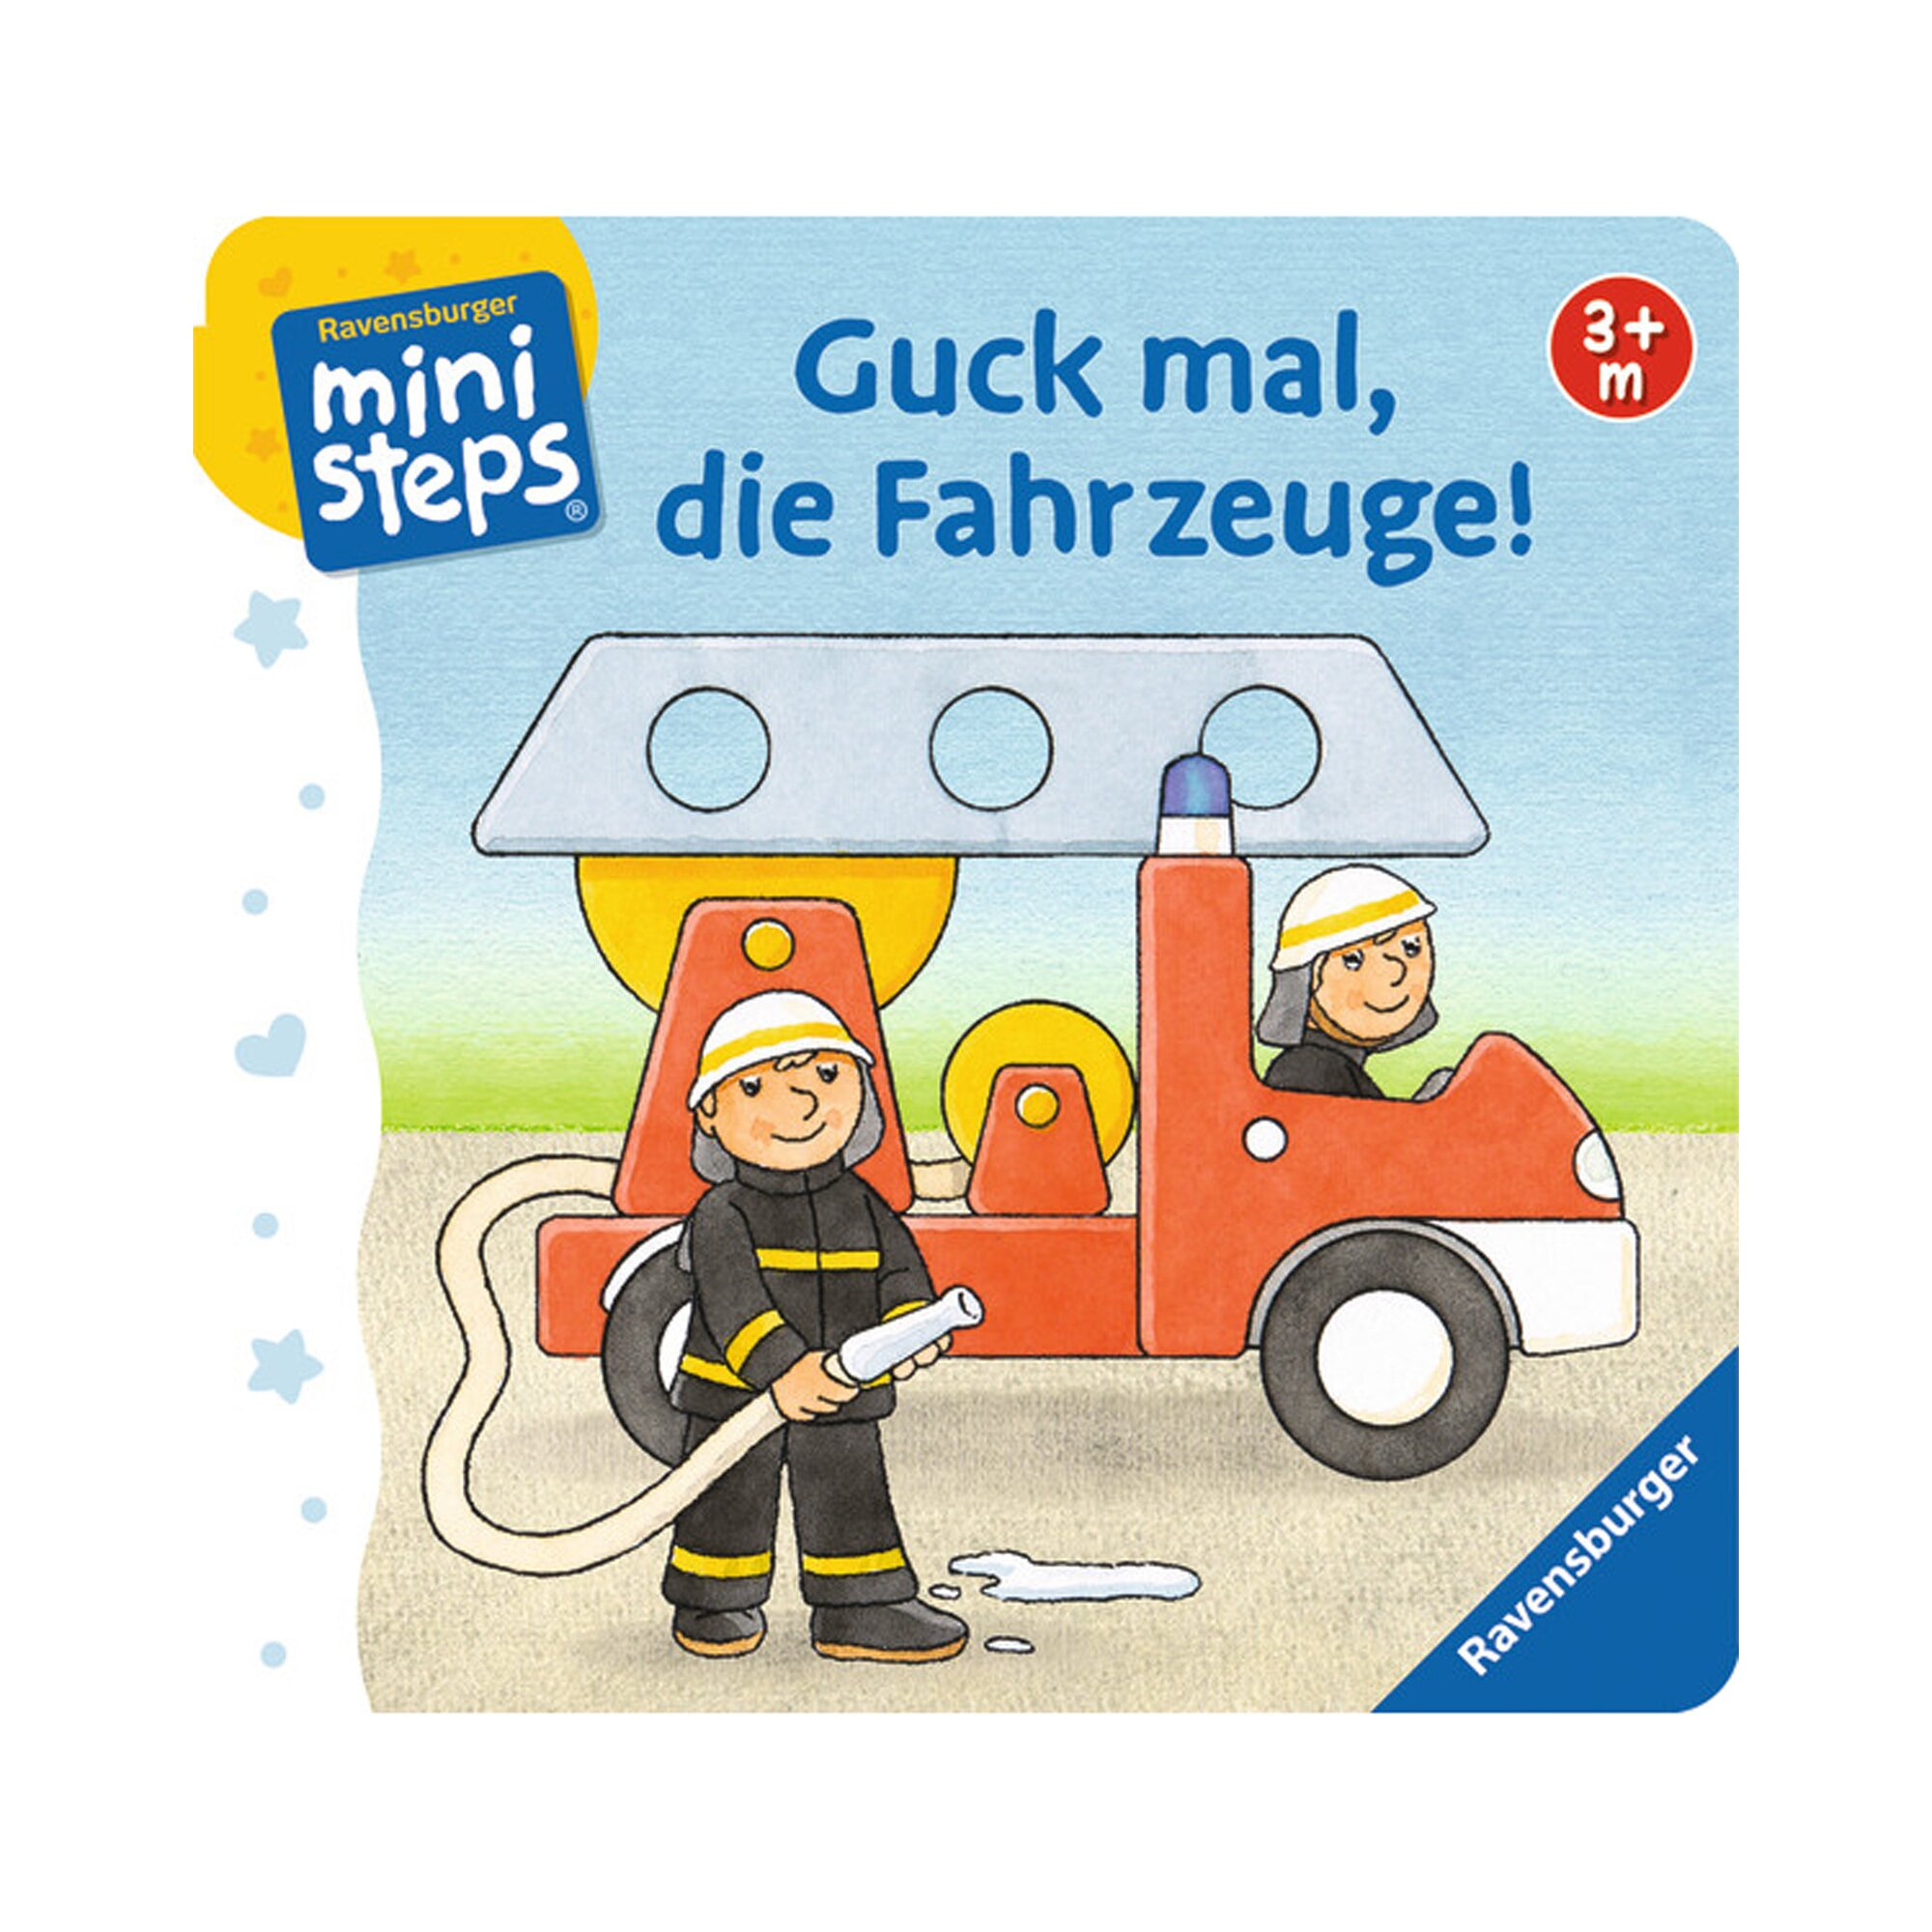 Ministeps Leporello Guck mal, die Fahrzeuge!